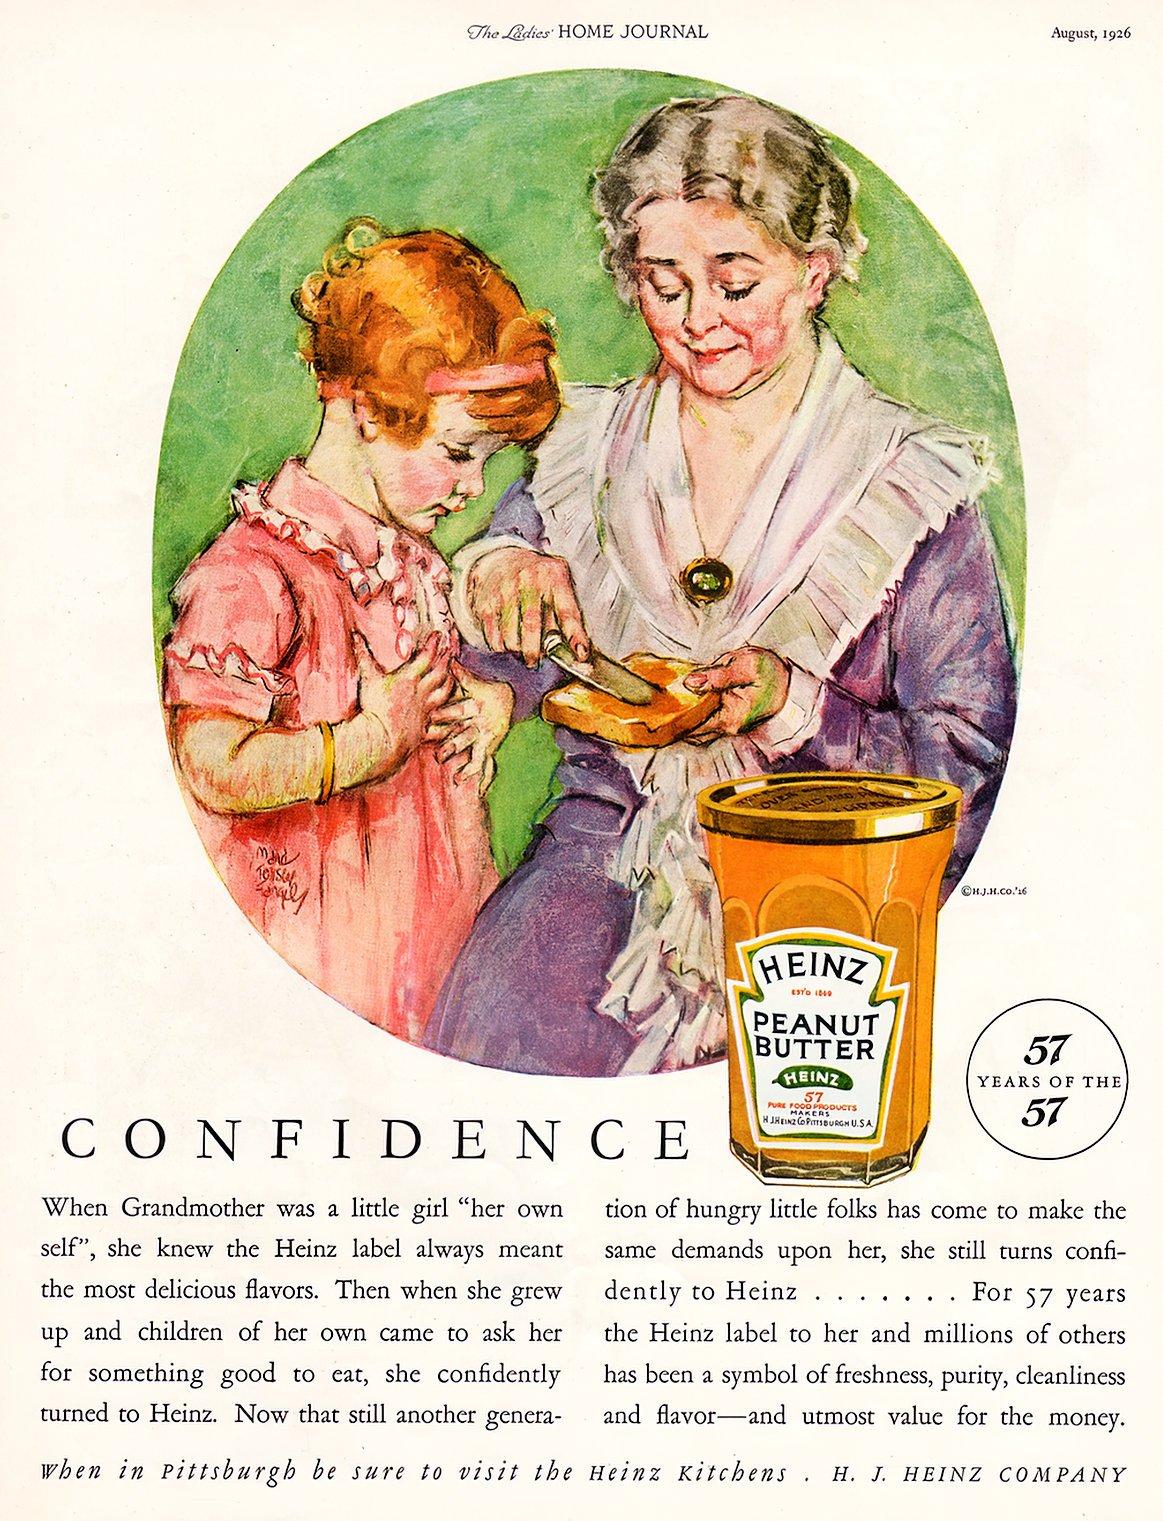 Vintage 1920s Heinz peanut butter